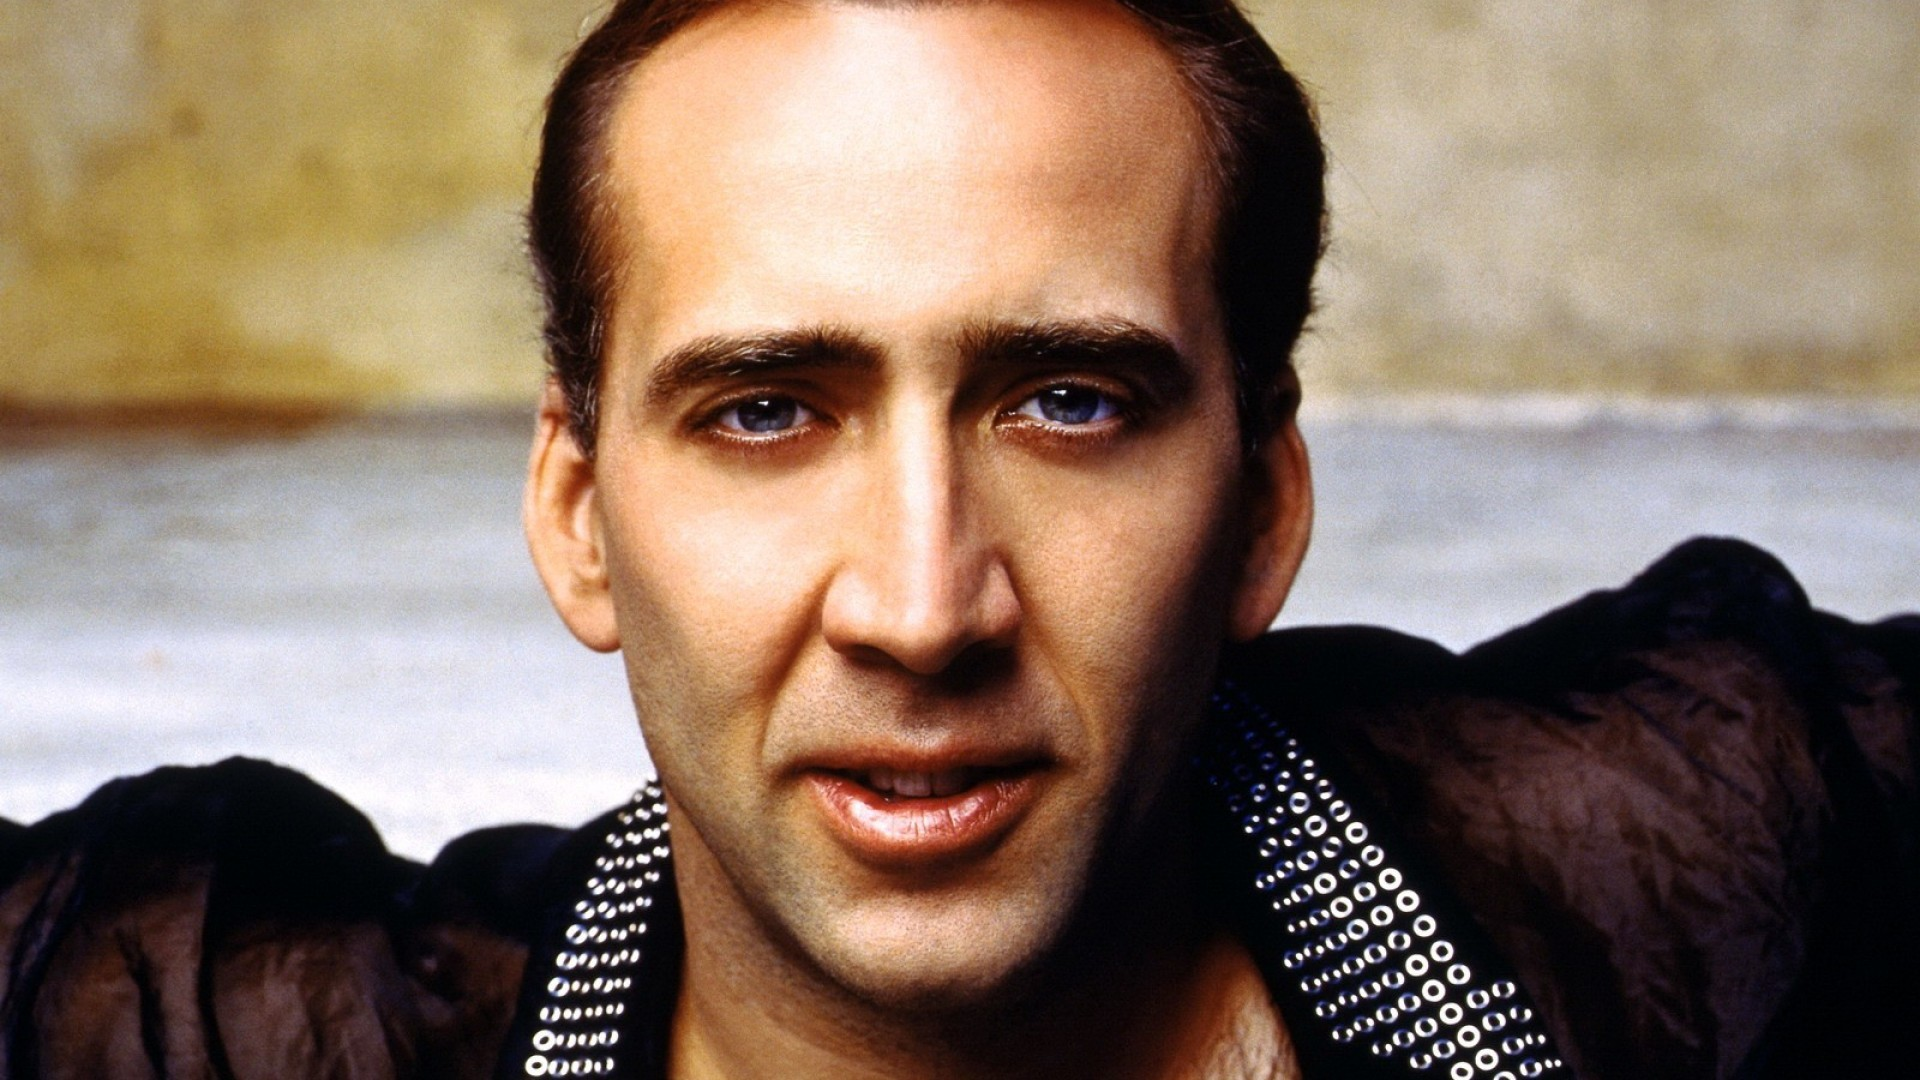 Nicolas Cage Images